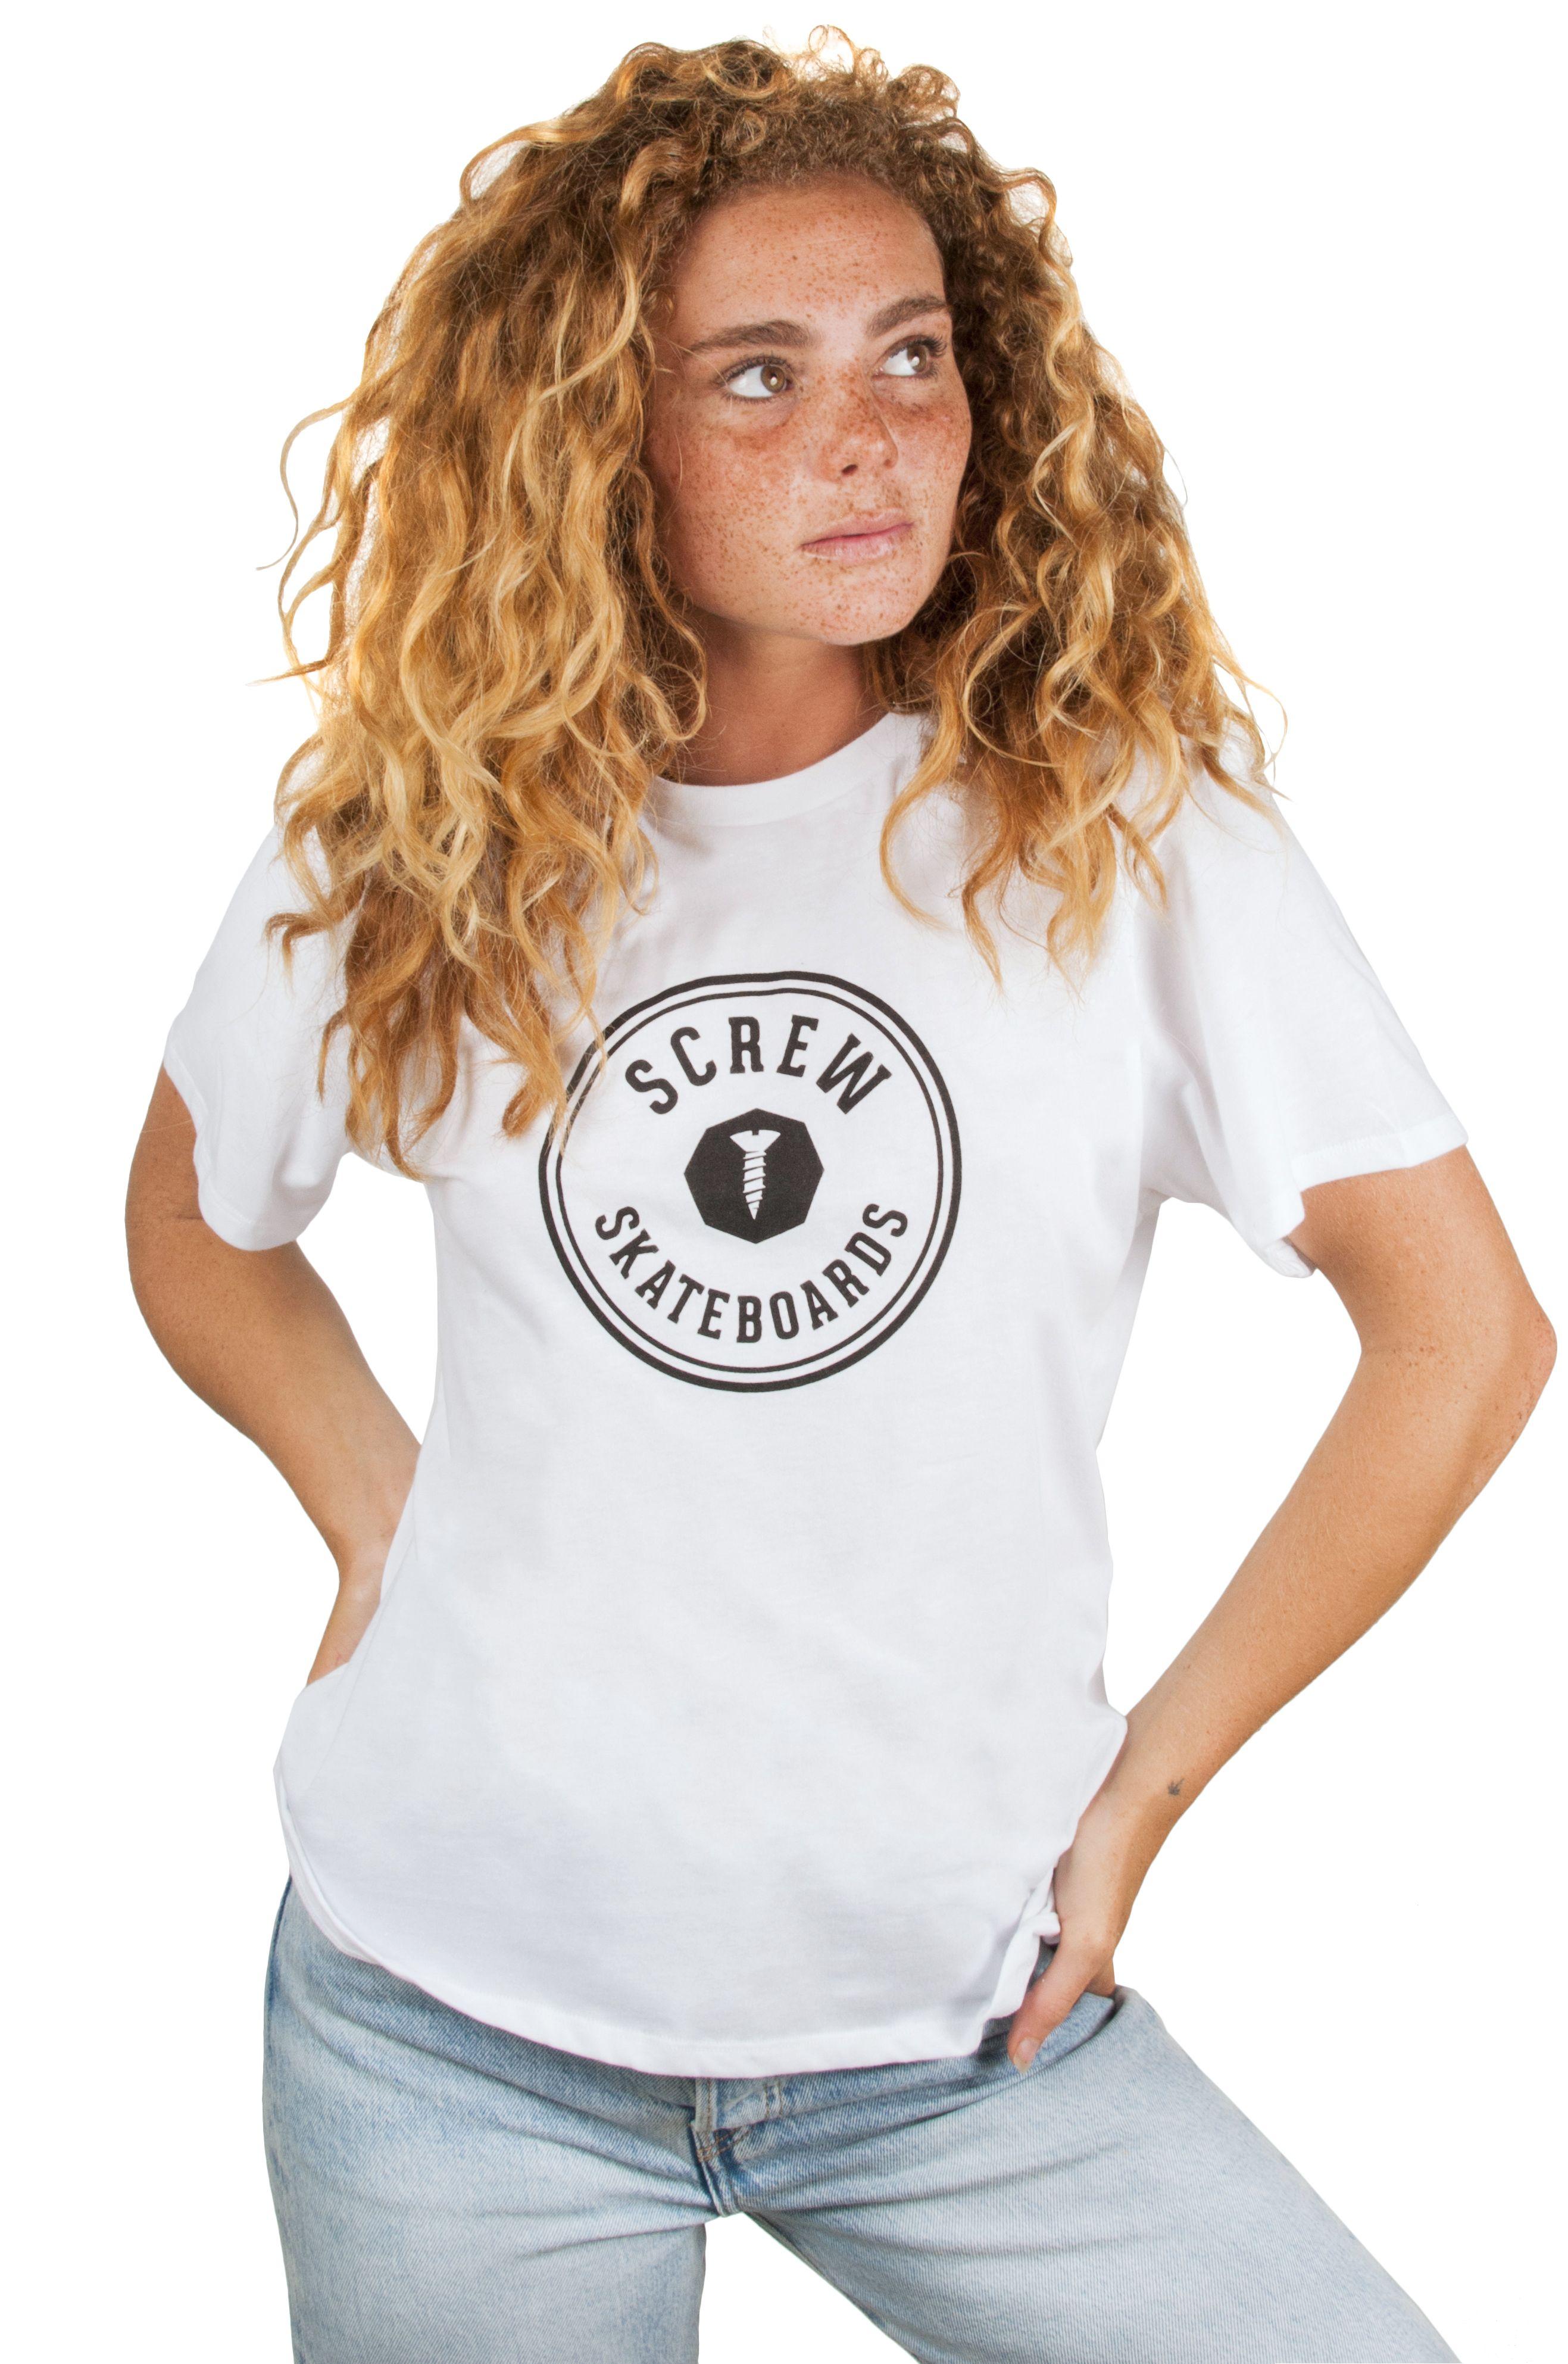 Screw T-Shirt SHOUT OUTLINE White